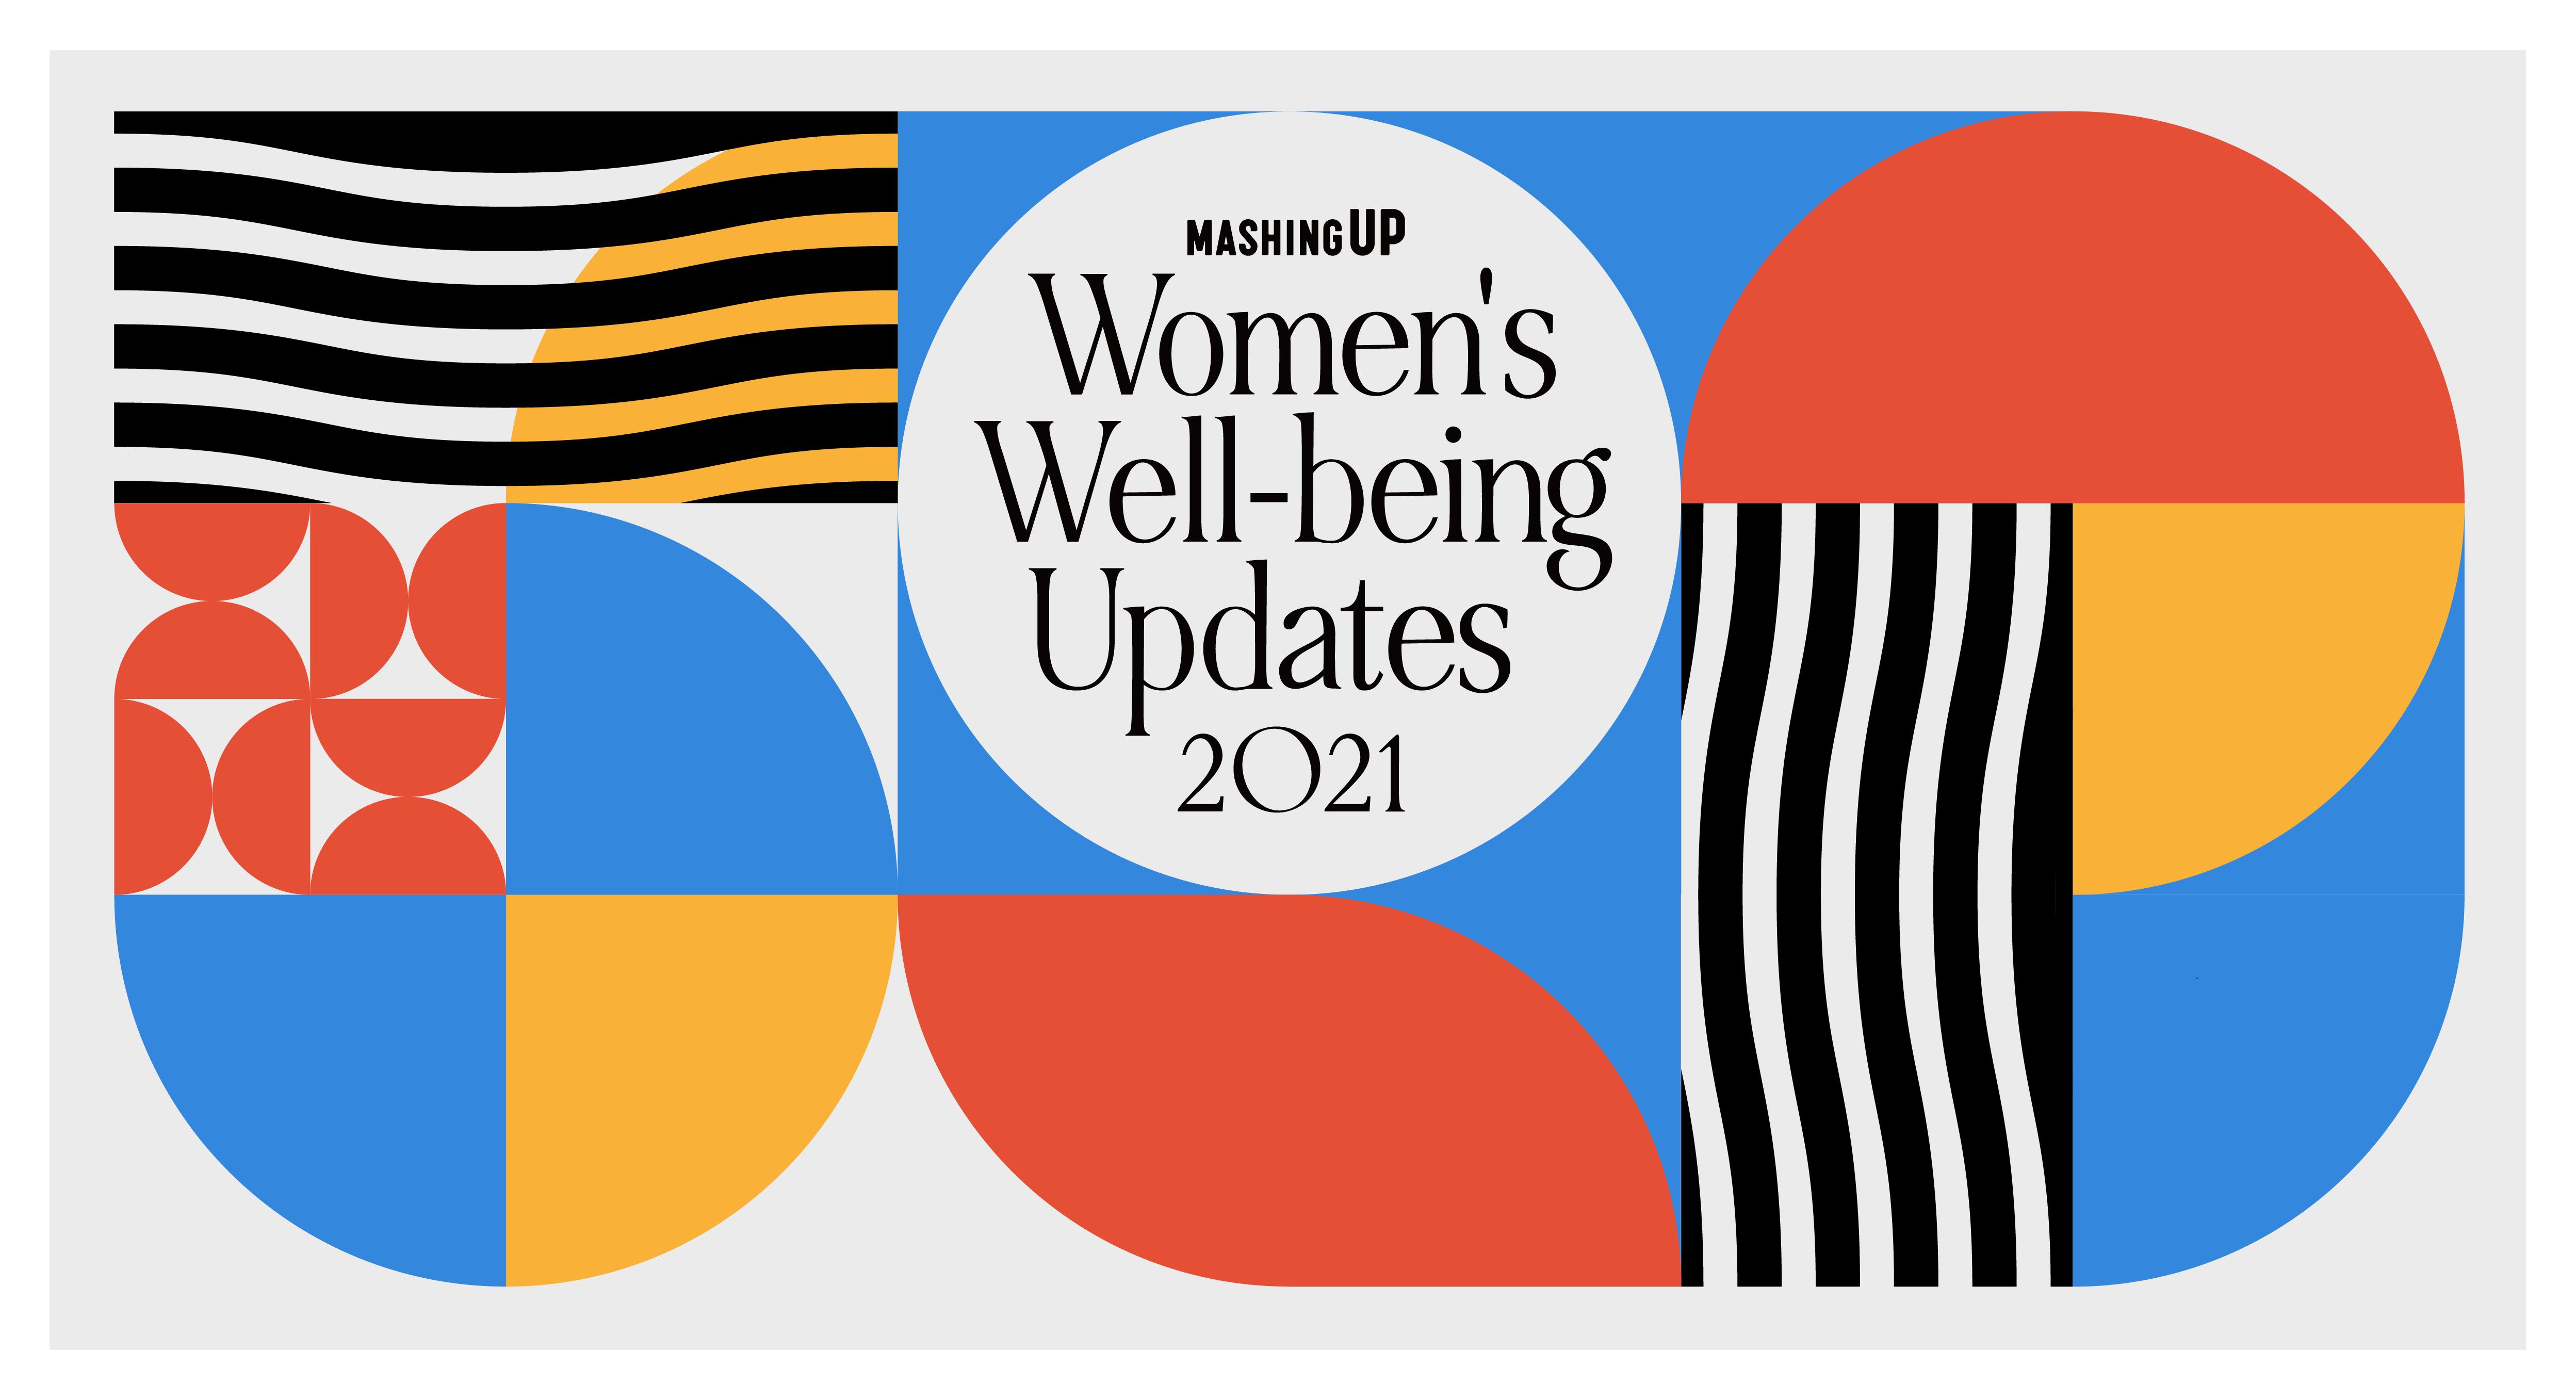 Women's Well-being Updates 2021